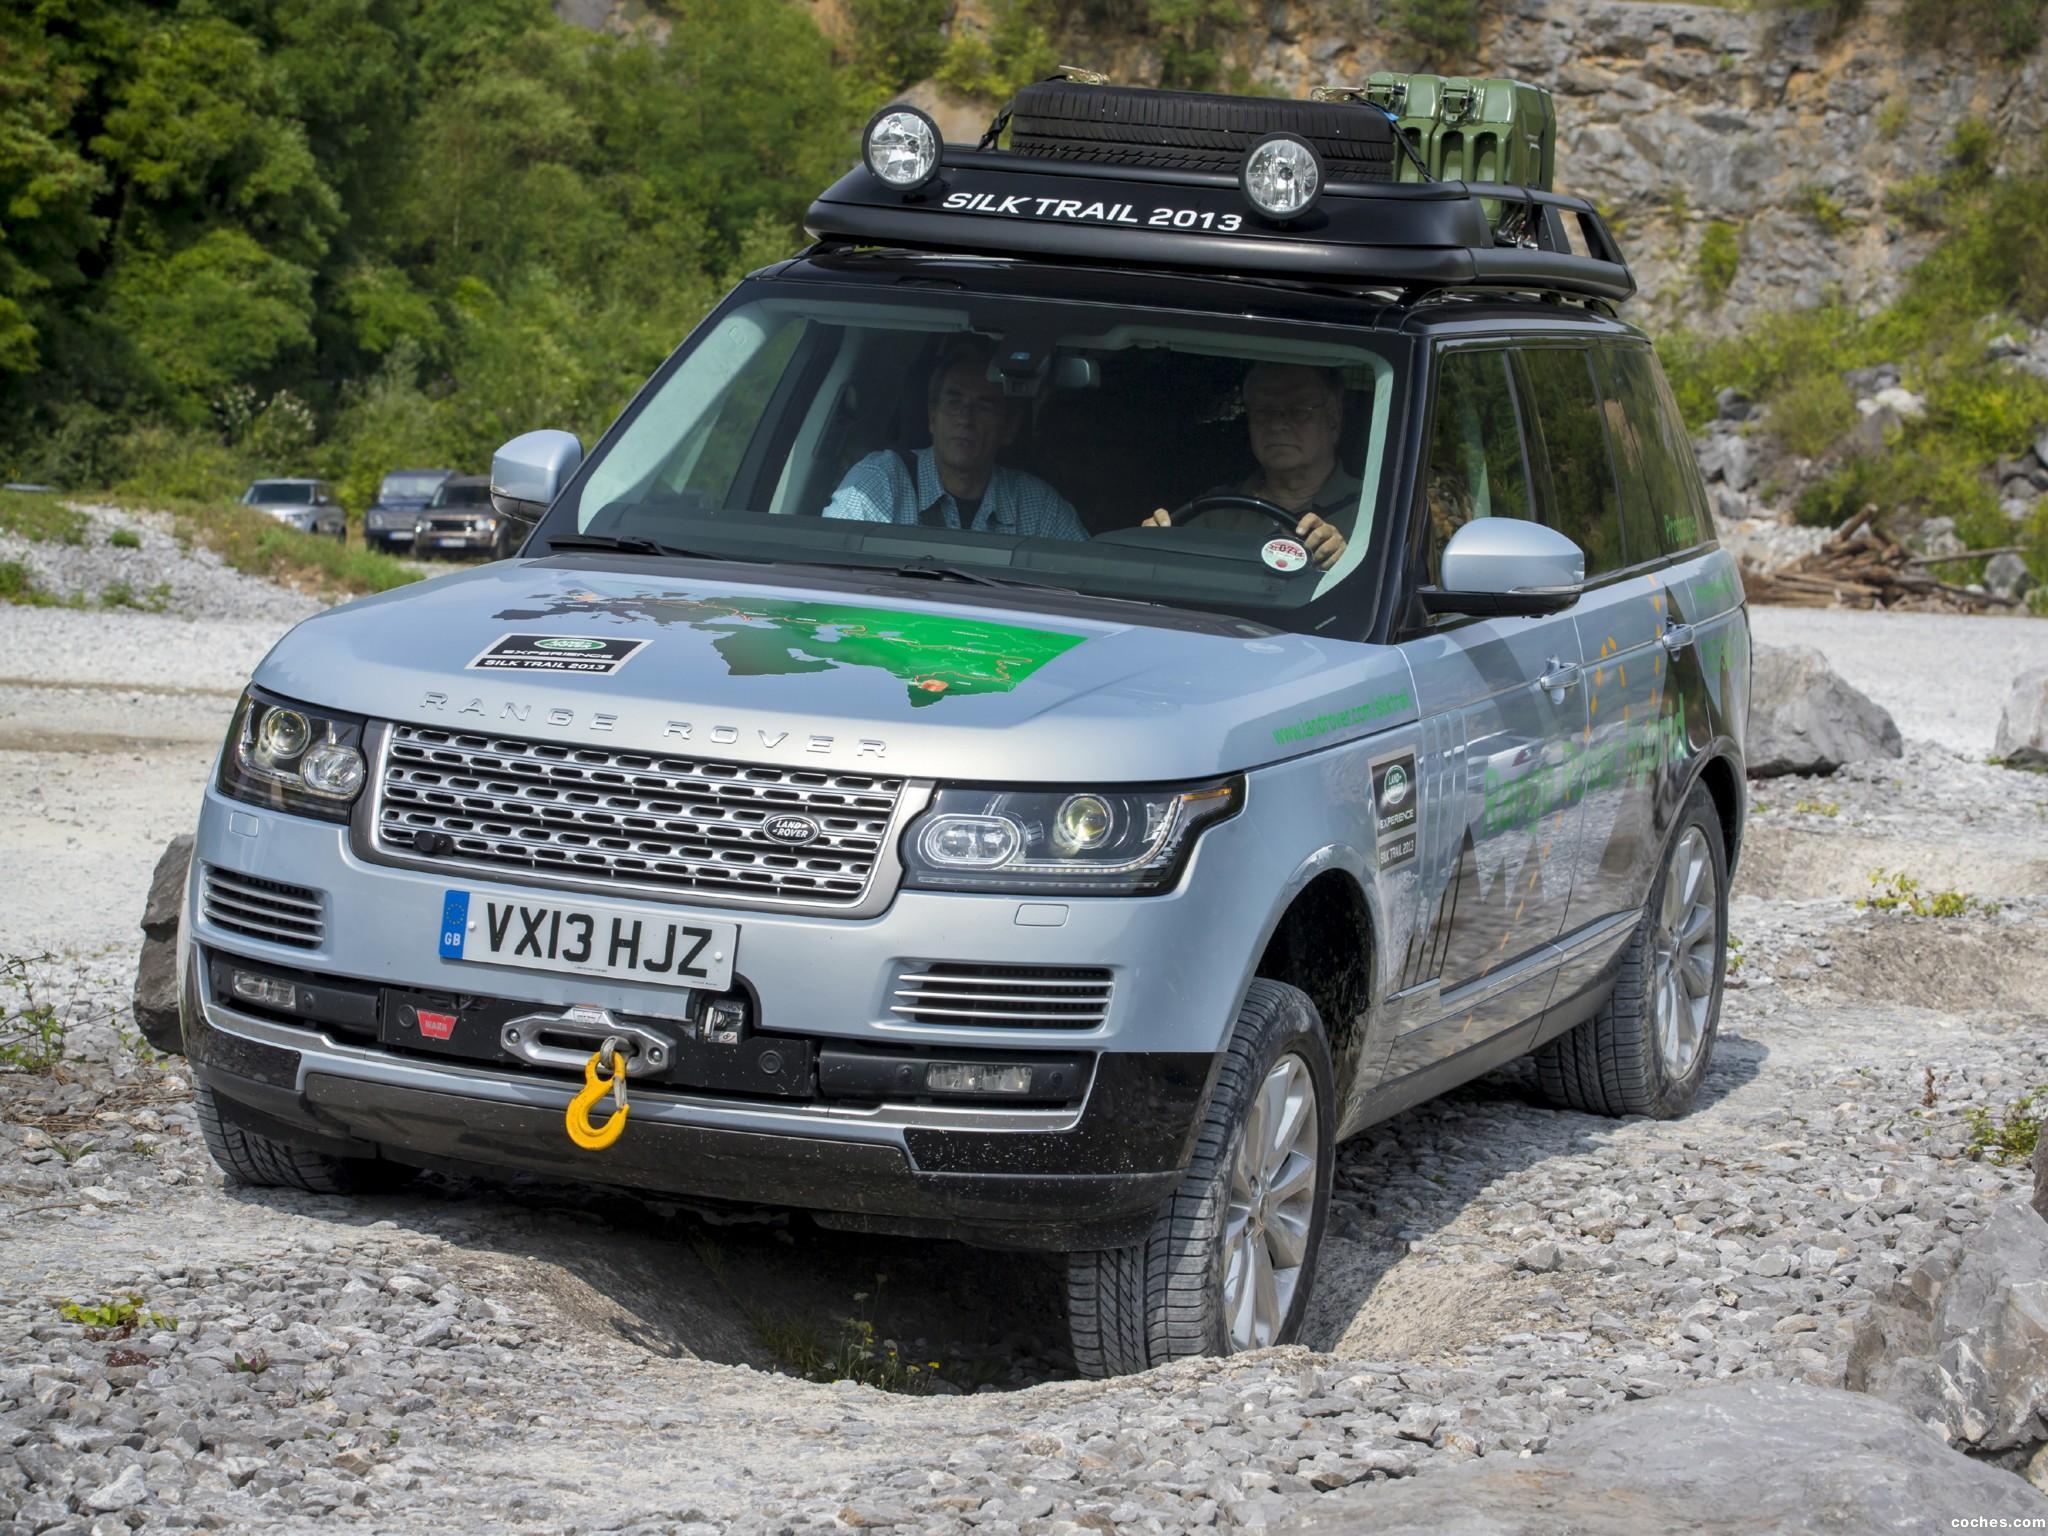 Foto 13 de Land Rover Range Rover Hybrid Prototype L405 2013